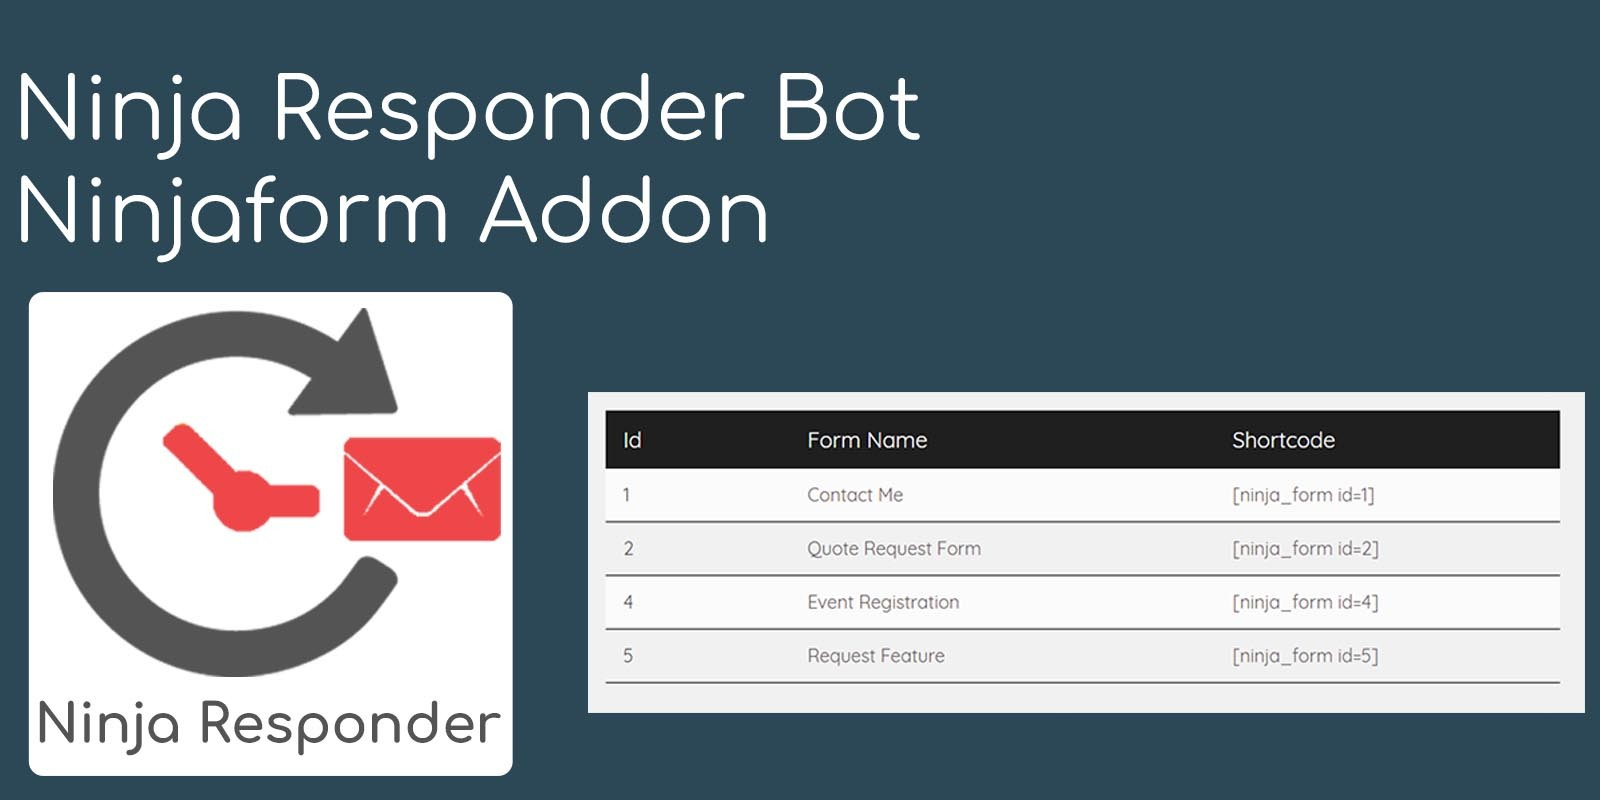 Ninja Responder Bot - Ninjaform Addon